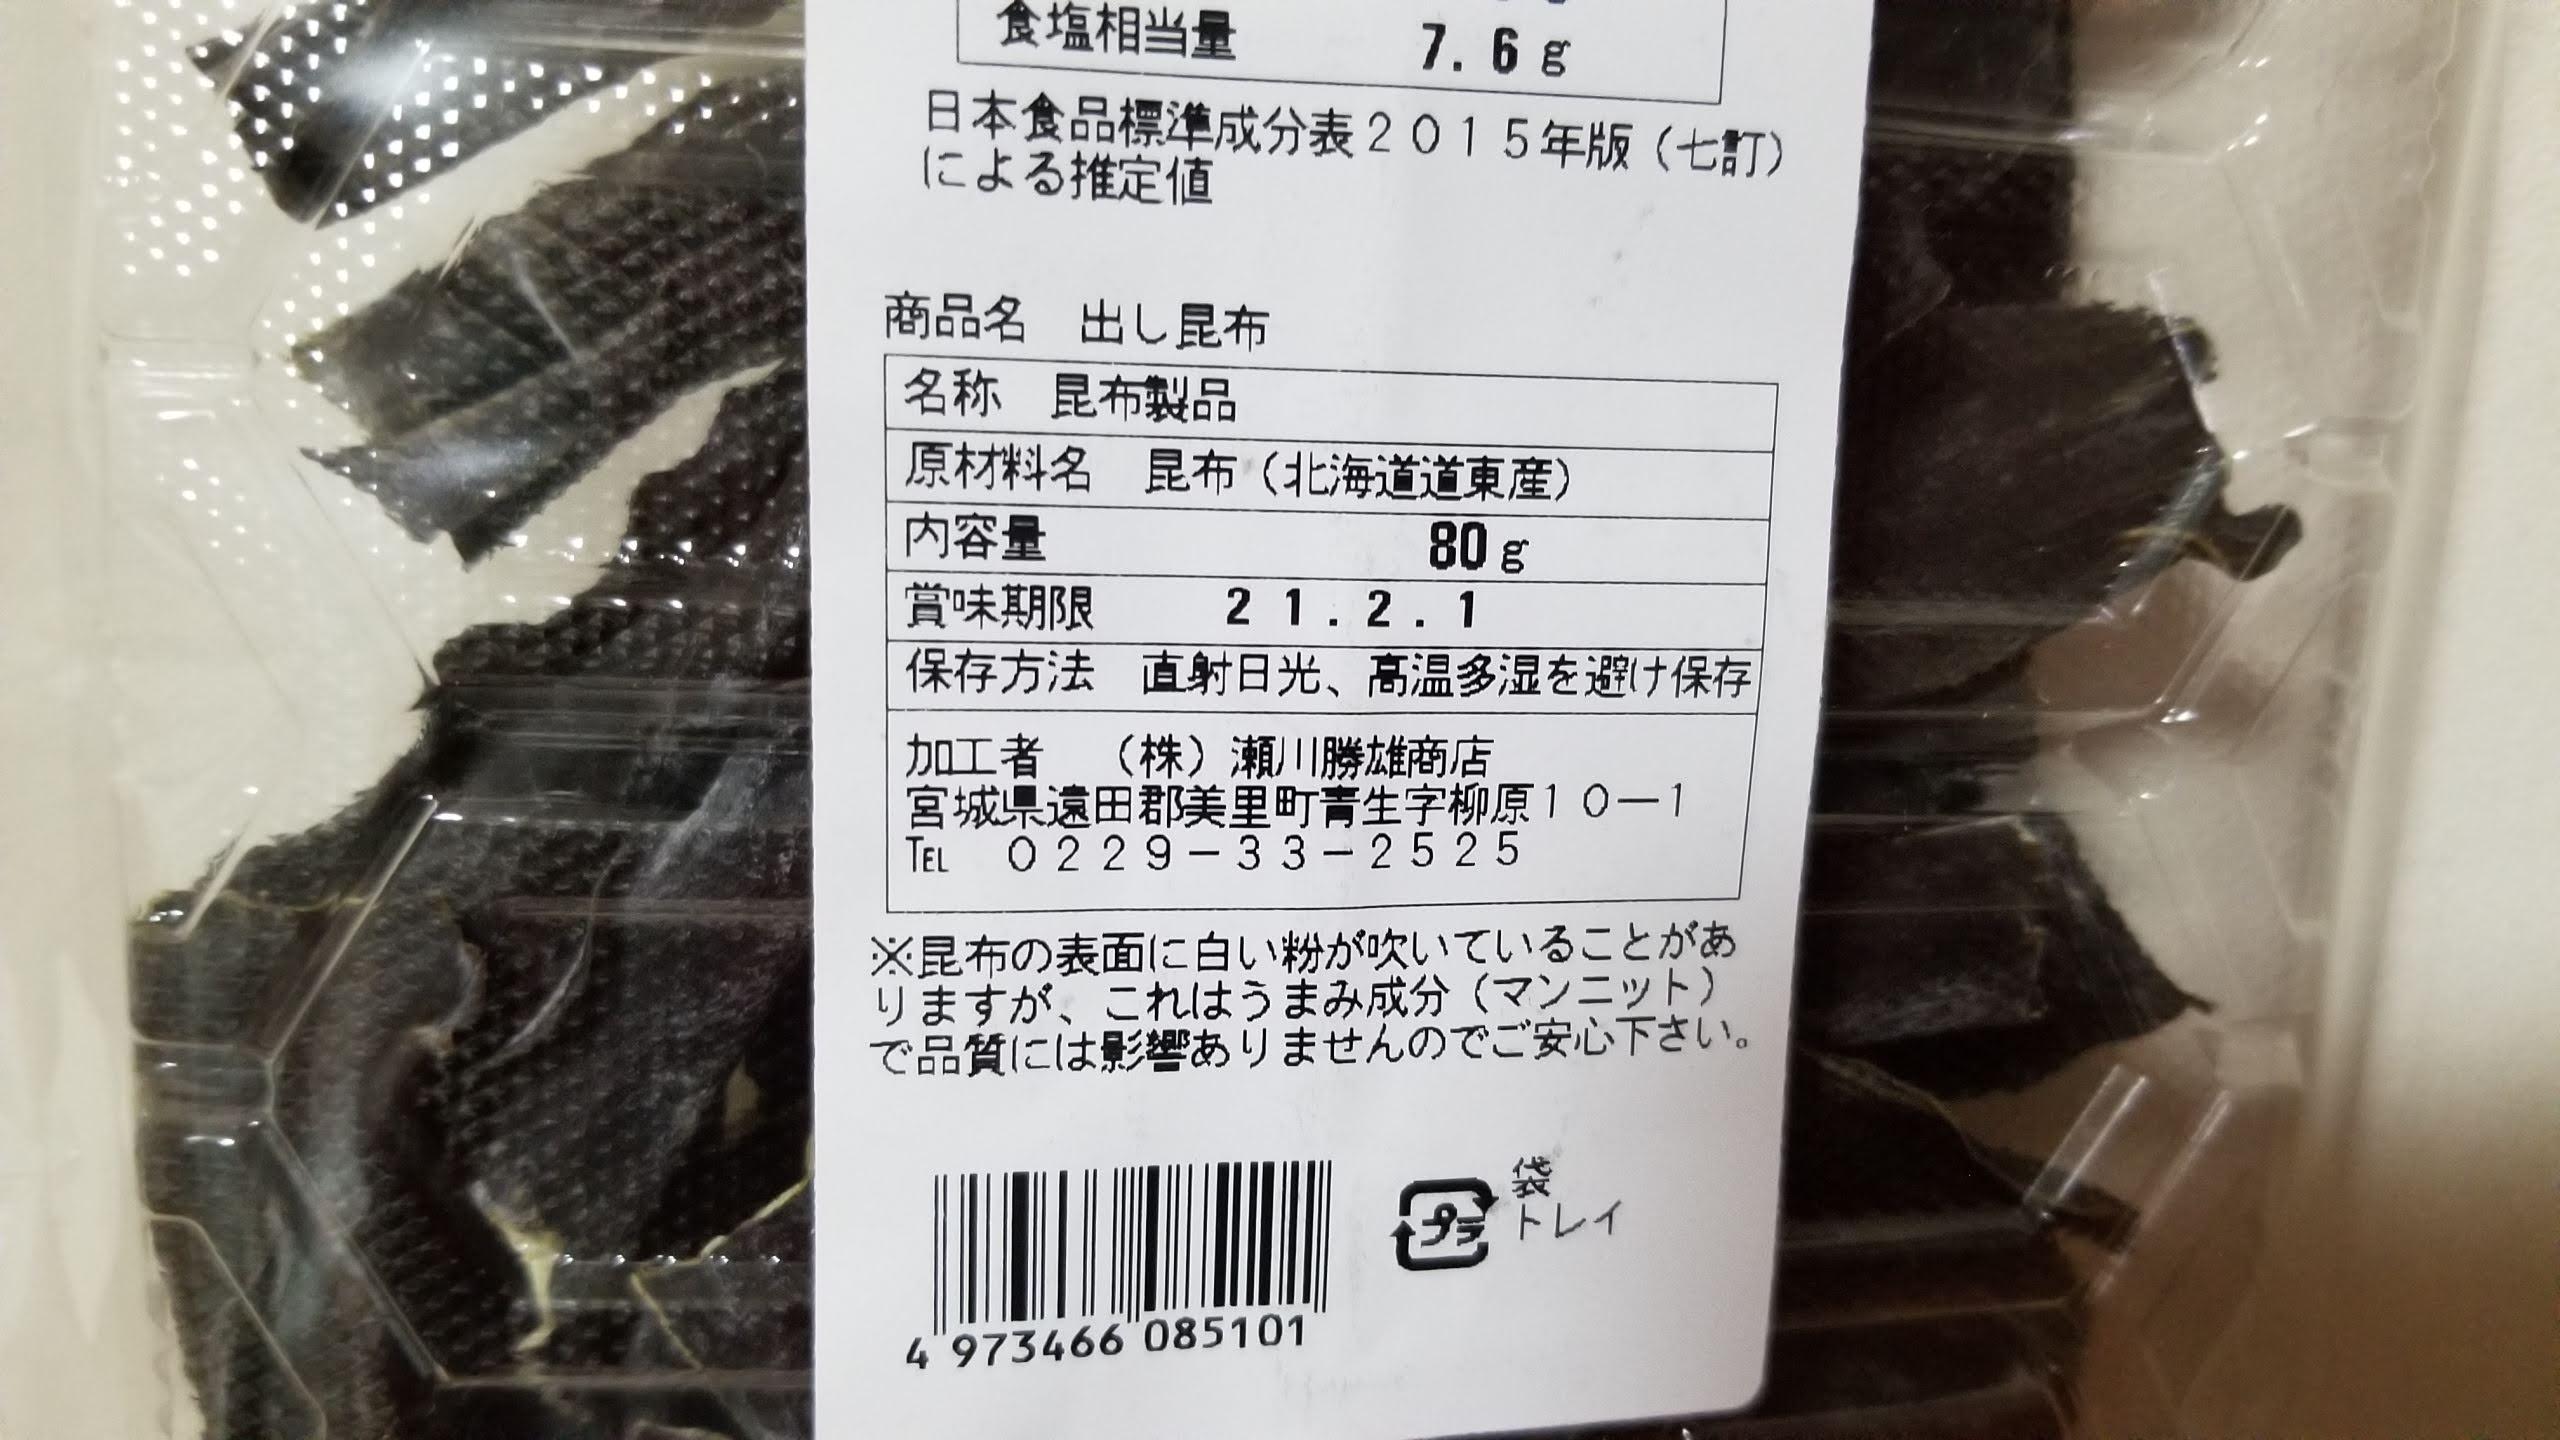 出し昆布/瀬川雄勝商店_20200307_184924